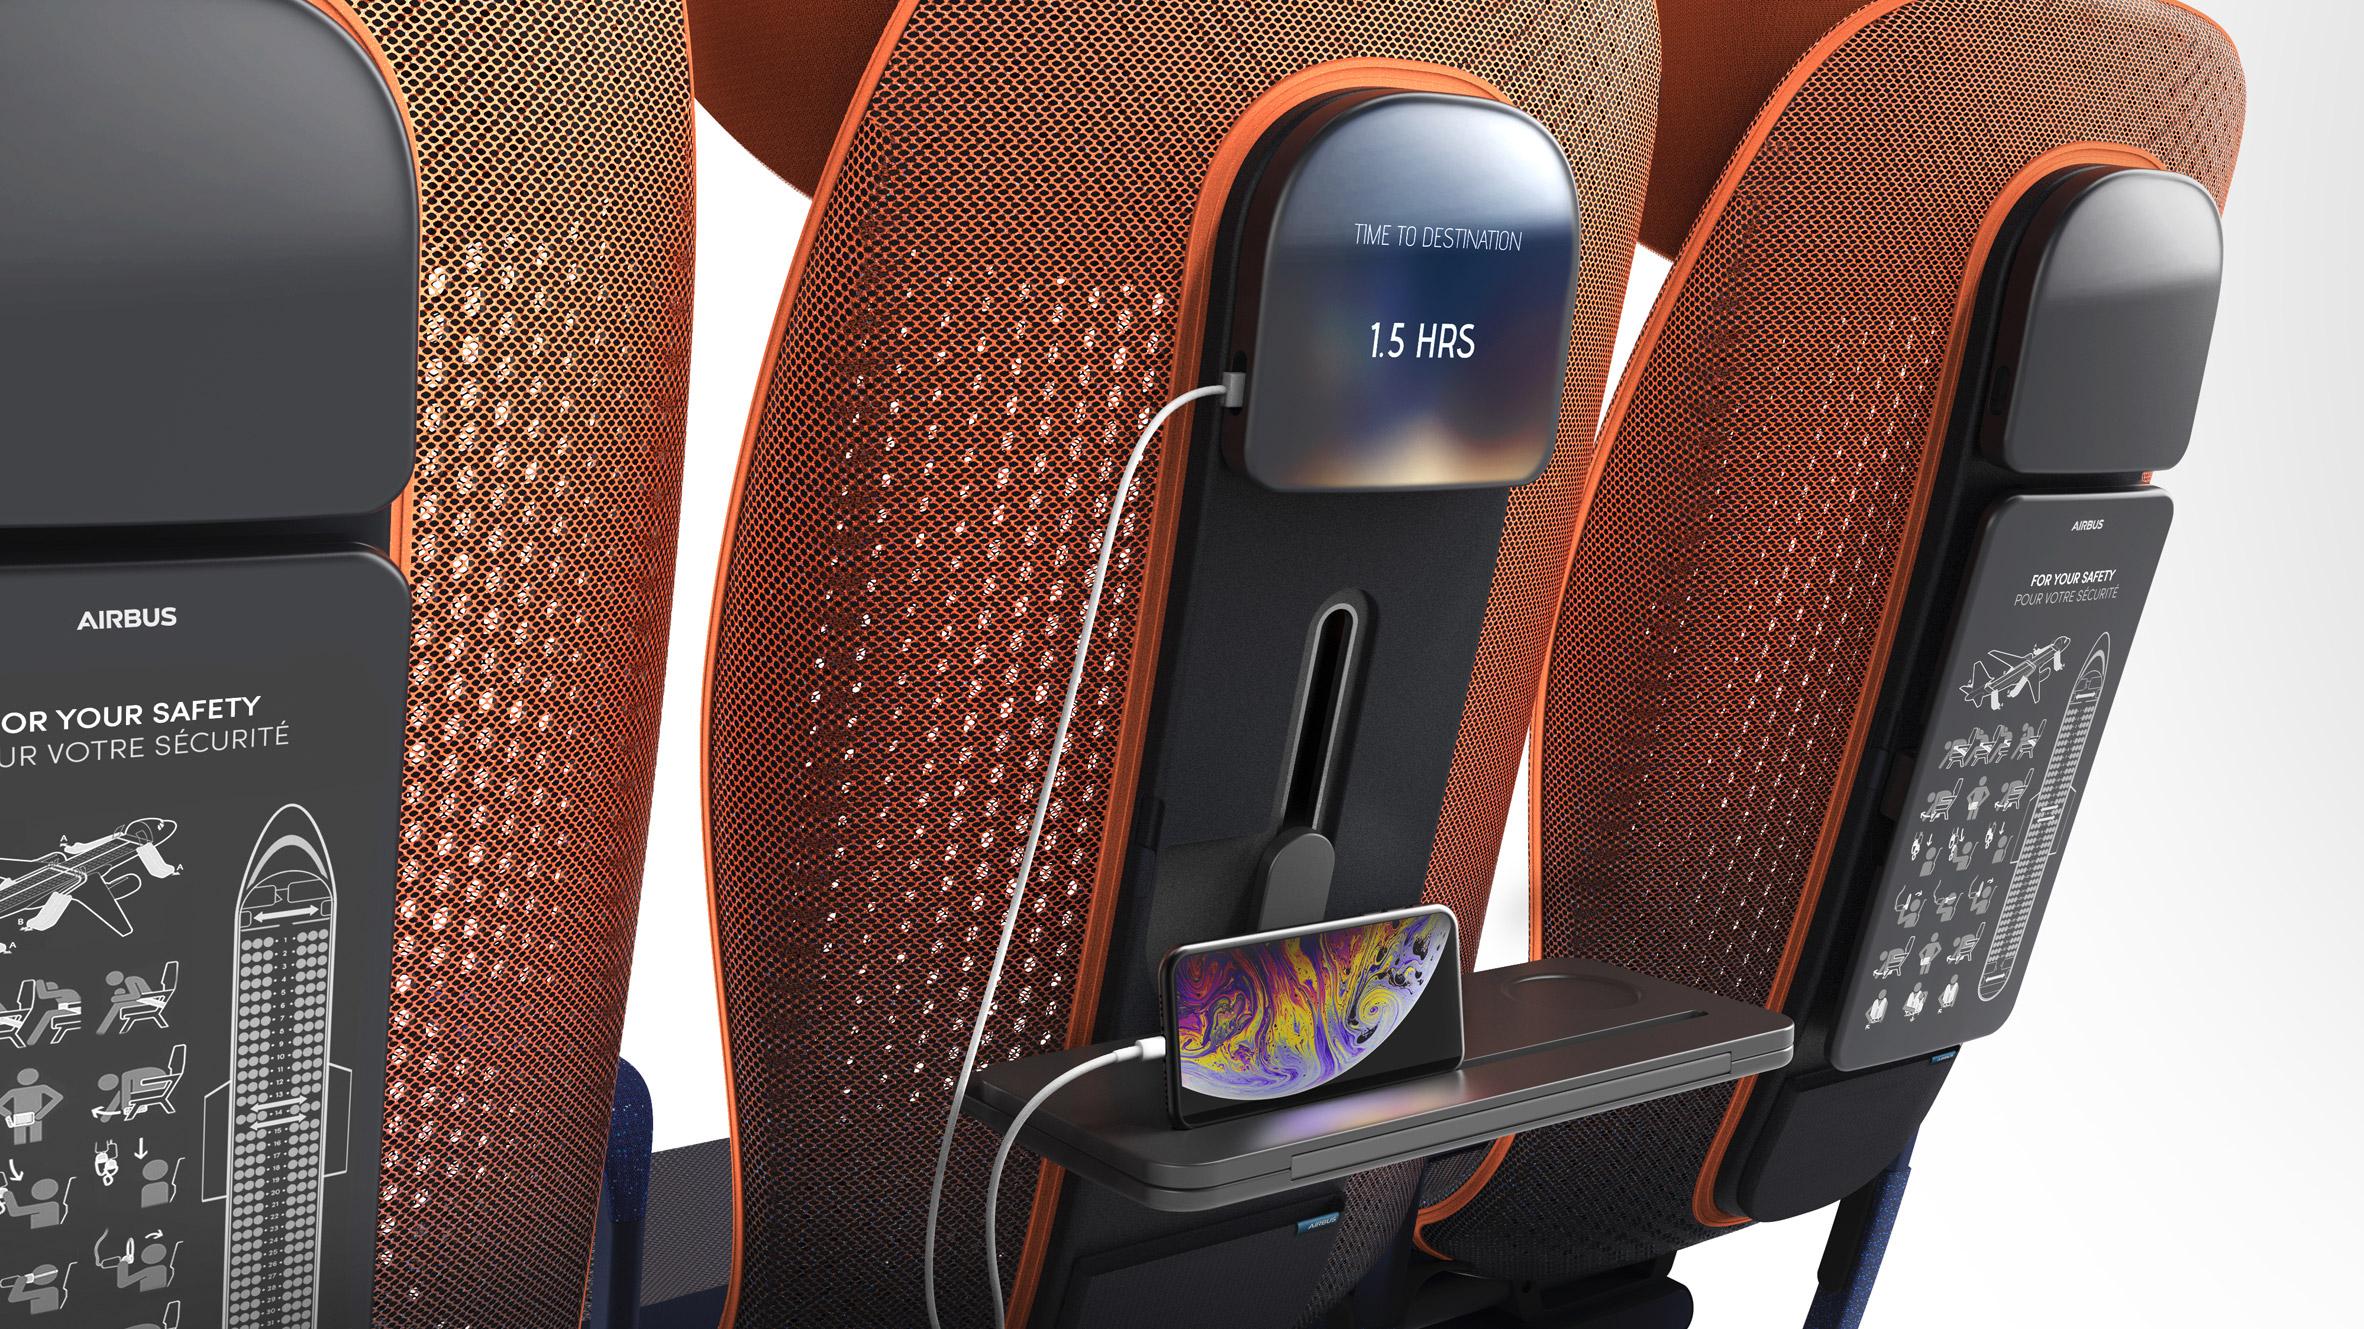 Layer's Move smart seat